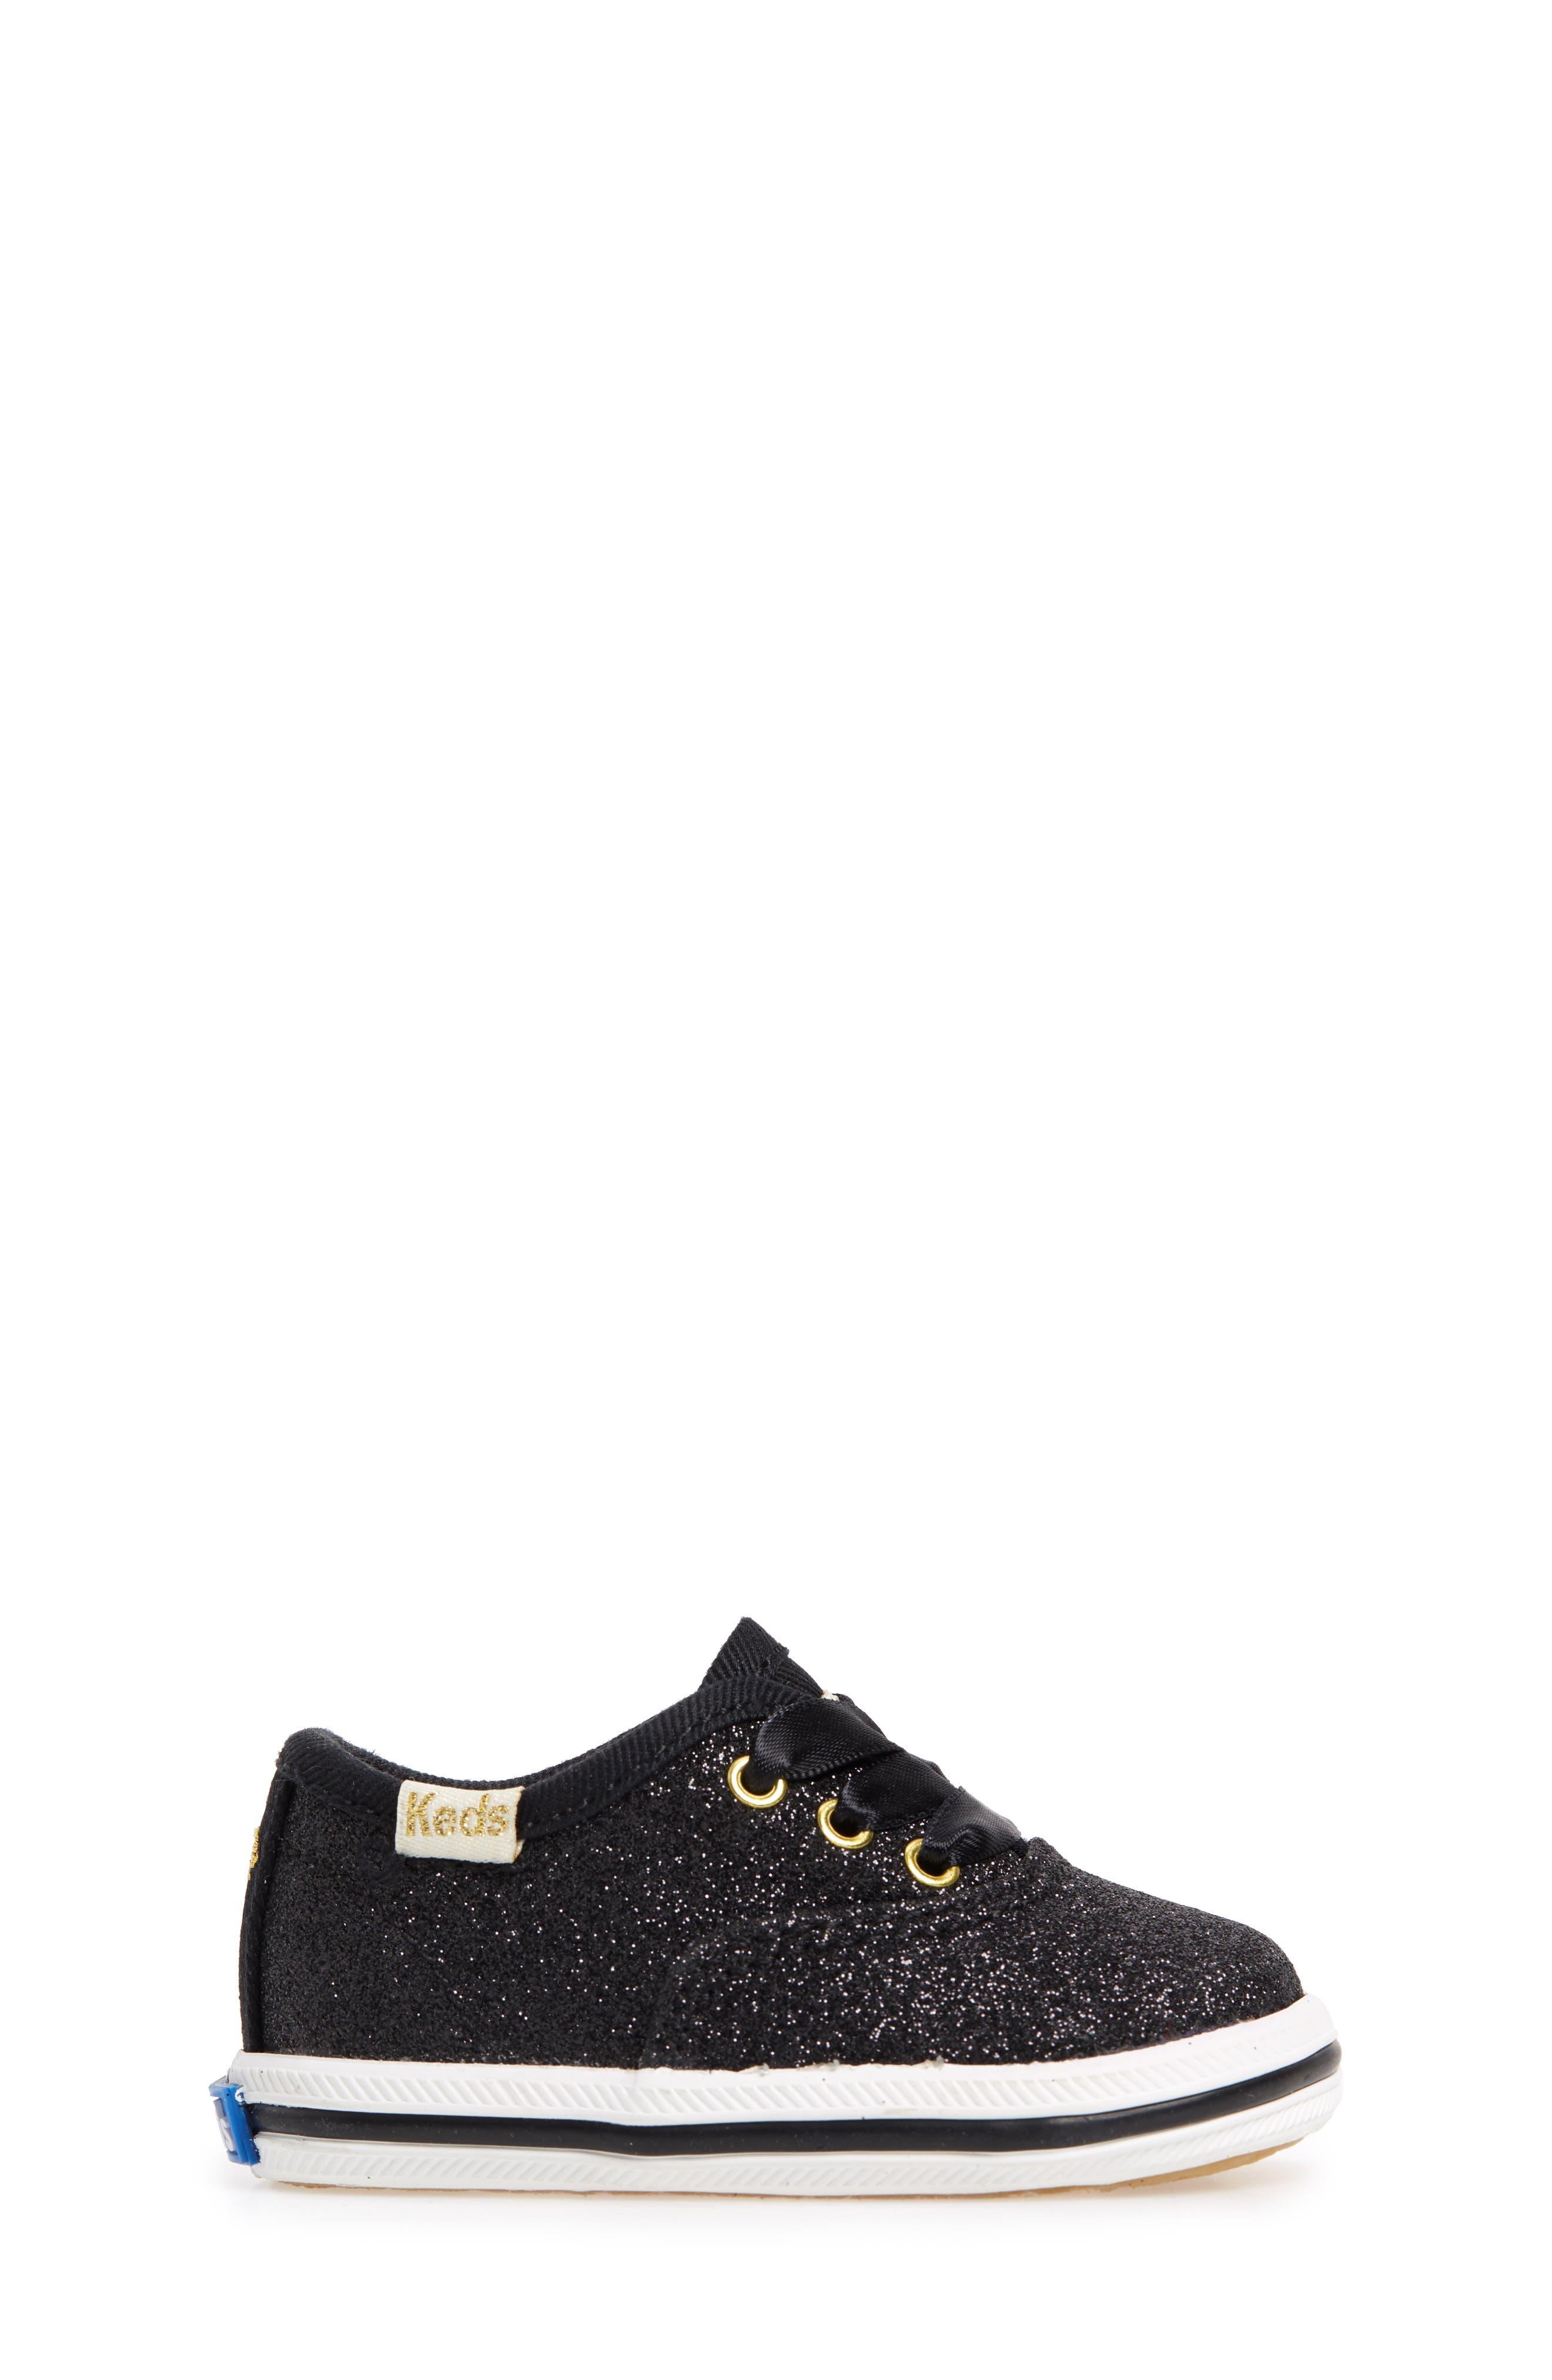 x kate spade new york Champion Glitter Crib Shoe,                             Alternate thumbnail 3, color,                             Black